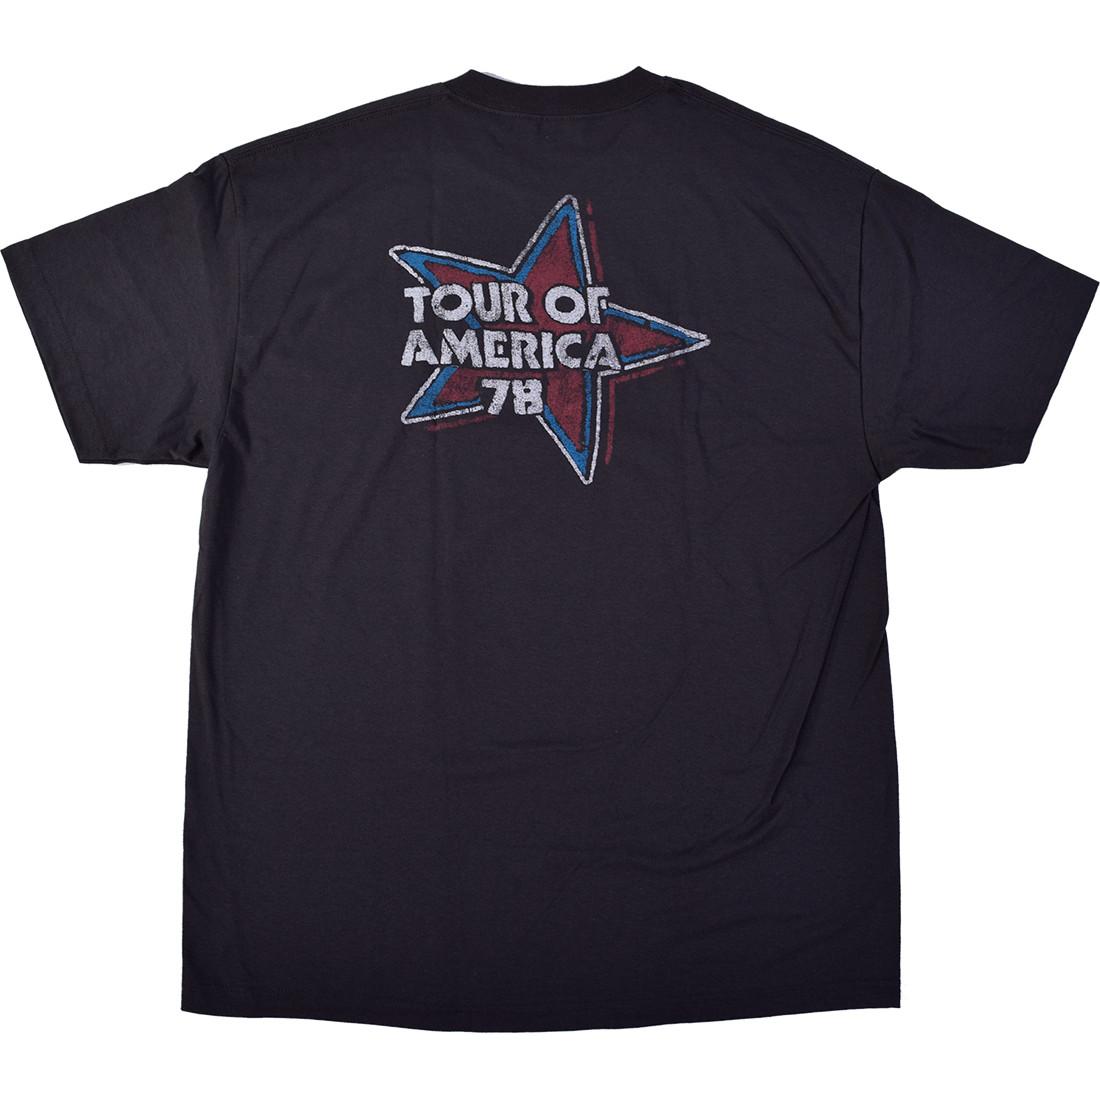 Rolling Stones Vintage Tongue Black T-Shirt